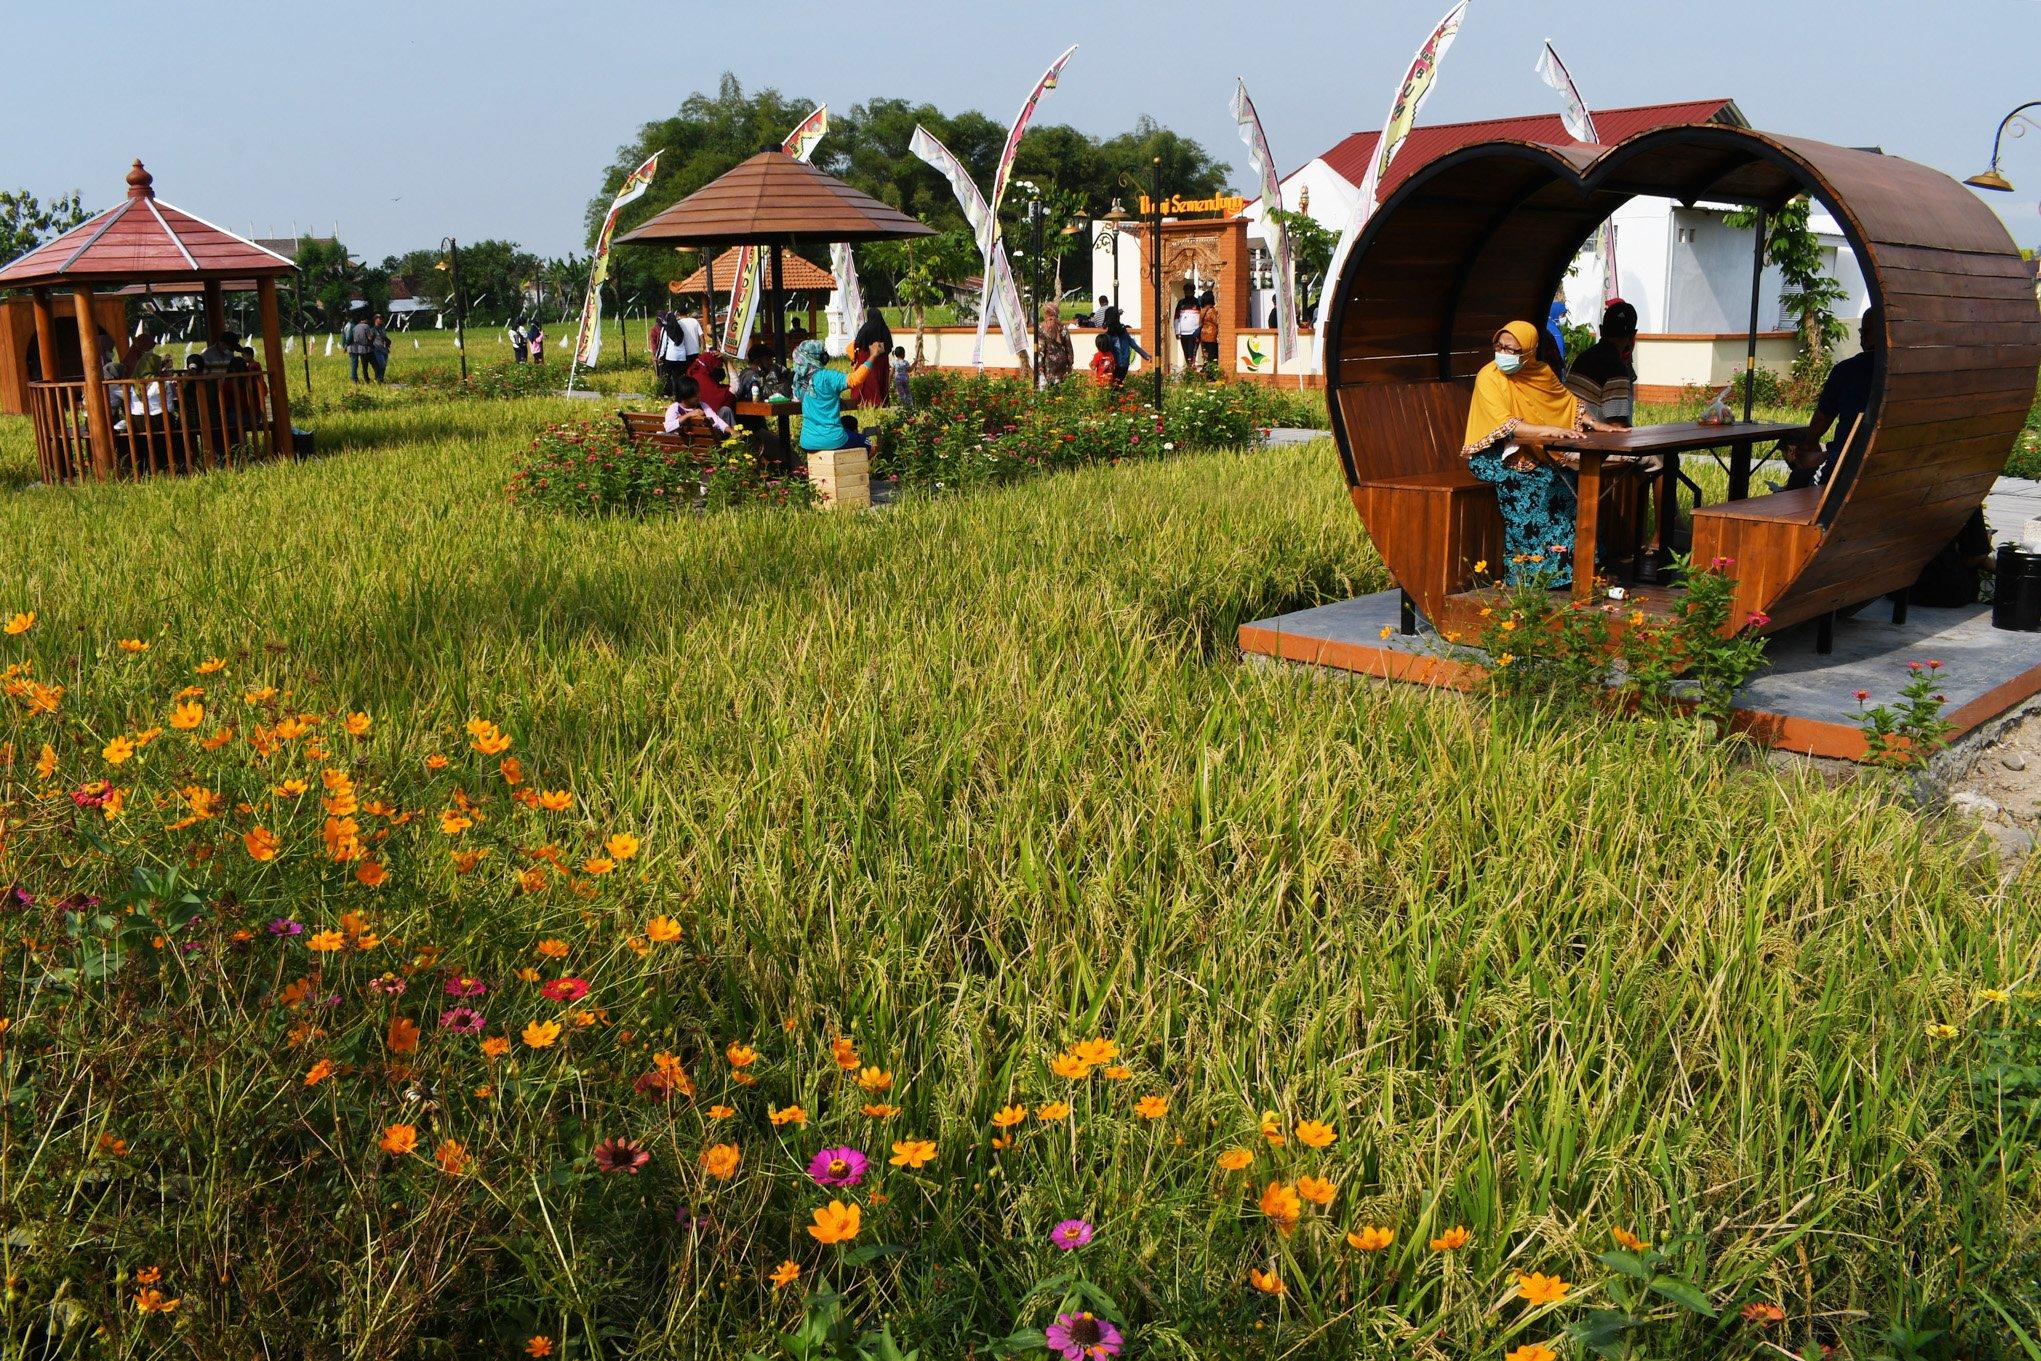 Pengunjung menikmati suasana objek wisata Lapak Bumi Semendung di Kelurahan Klegen, Kota Madiun, Jawa Timur, Minggu (26/9/2021). Pemkot Madiun membangun objek wisata dan lapak Usaha Mikro Kecil Menengah (UMKM) di areal persawahan tersebut untuk menarik wisatawan serta menumbuhkan perekonomian bagi warga setempat. ANTARA FOTO/Siswowidodo/foc.